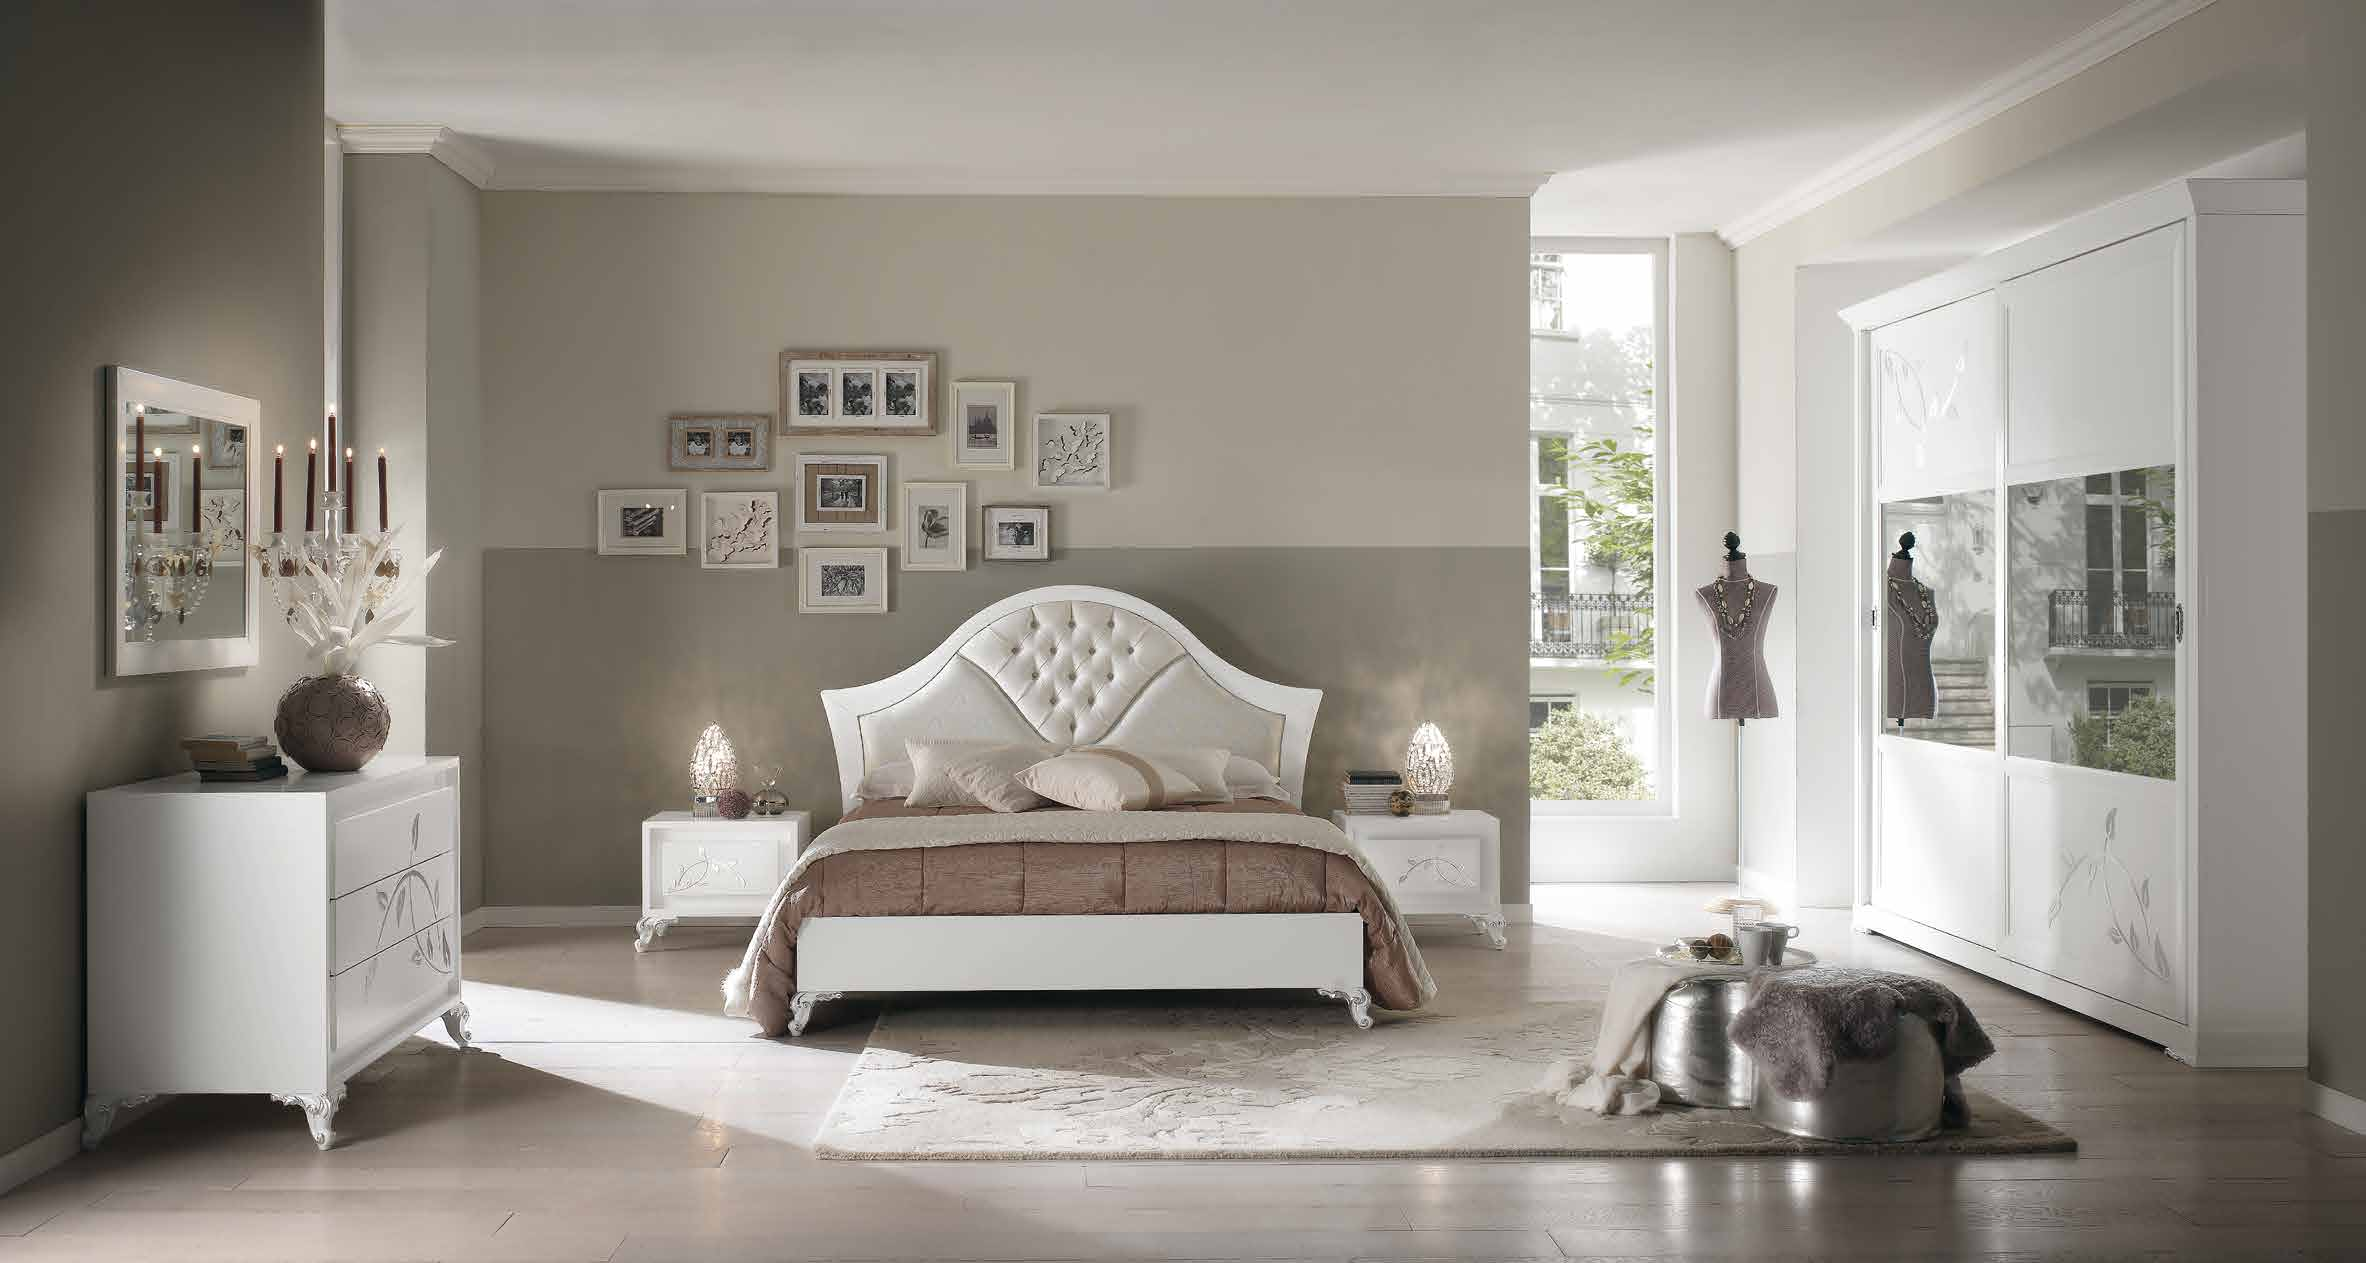 Full Size of Komplettes Schlafzimmer Af173 Ein Stilmbel Kollektion Deckenleuchte Günstige Komplett Massivholz Led Set Weiß Vorhänge Kommode Truhe Rauch Sessel Schlafzimmer Komplettes Schlafzimmer